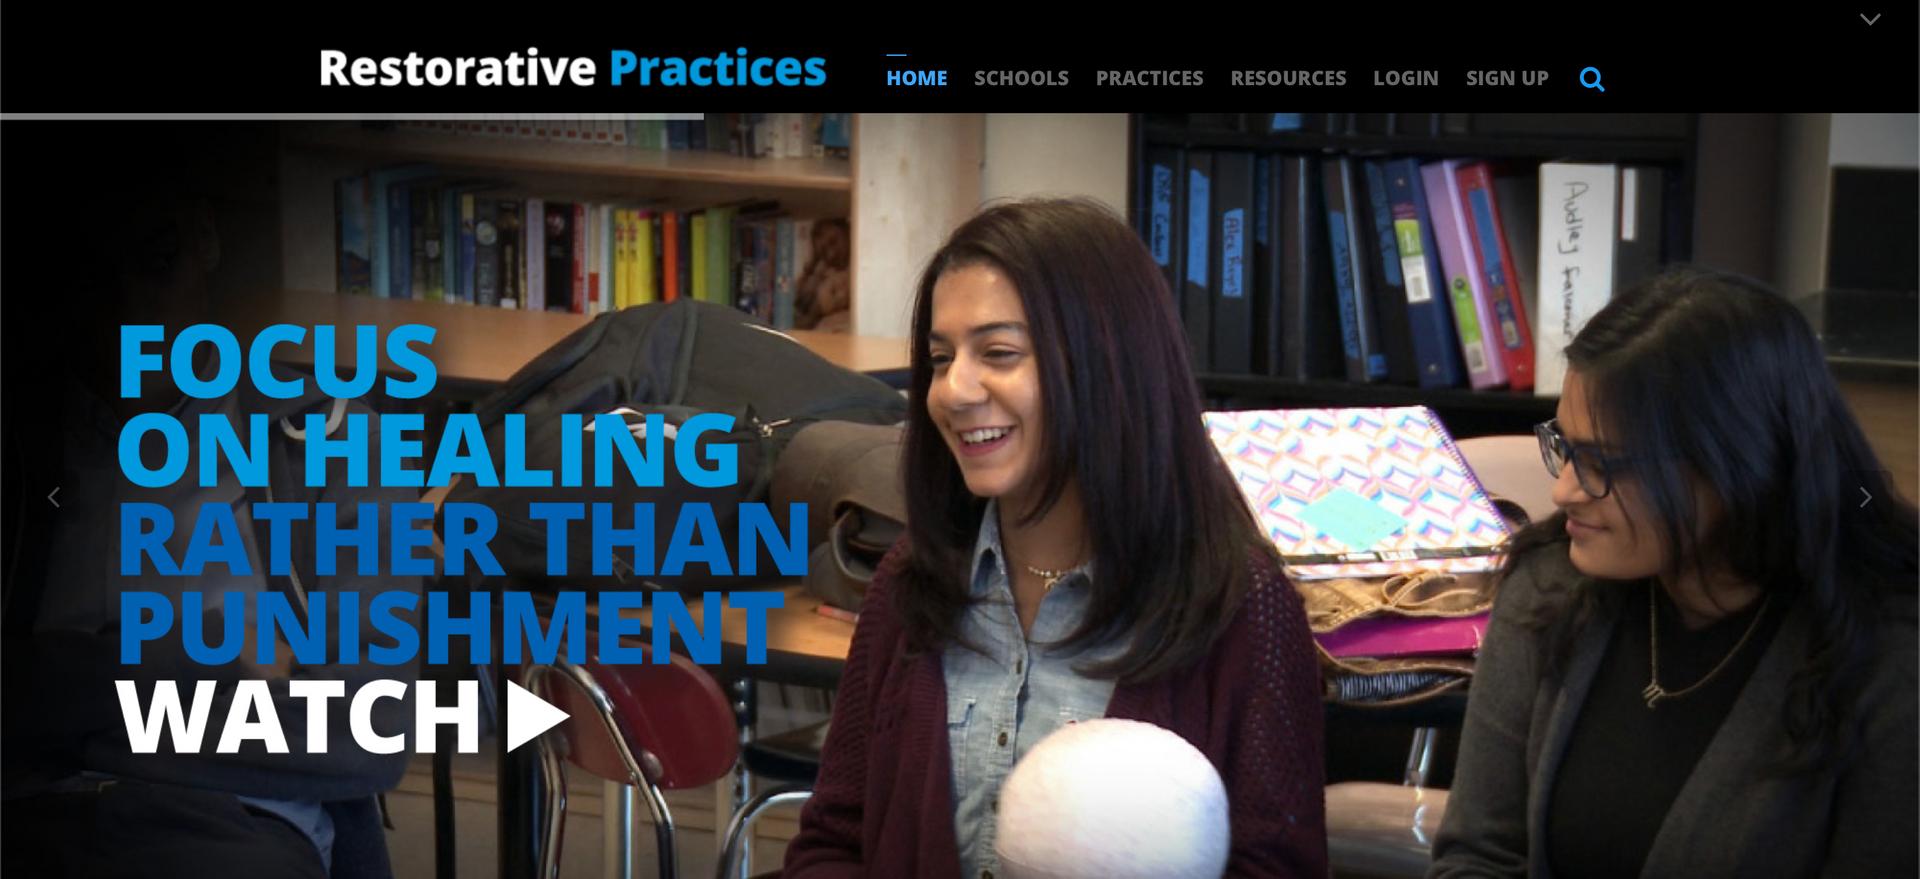 Restorative Practices: Focus on Healing Rather Than Punishment